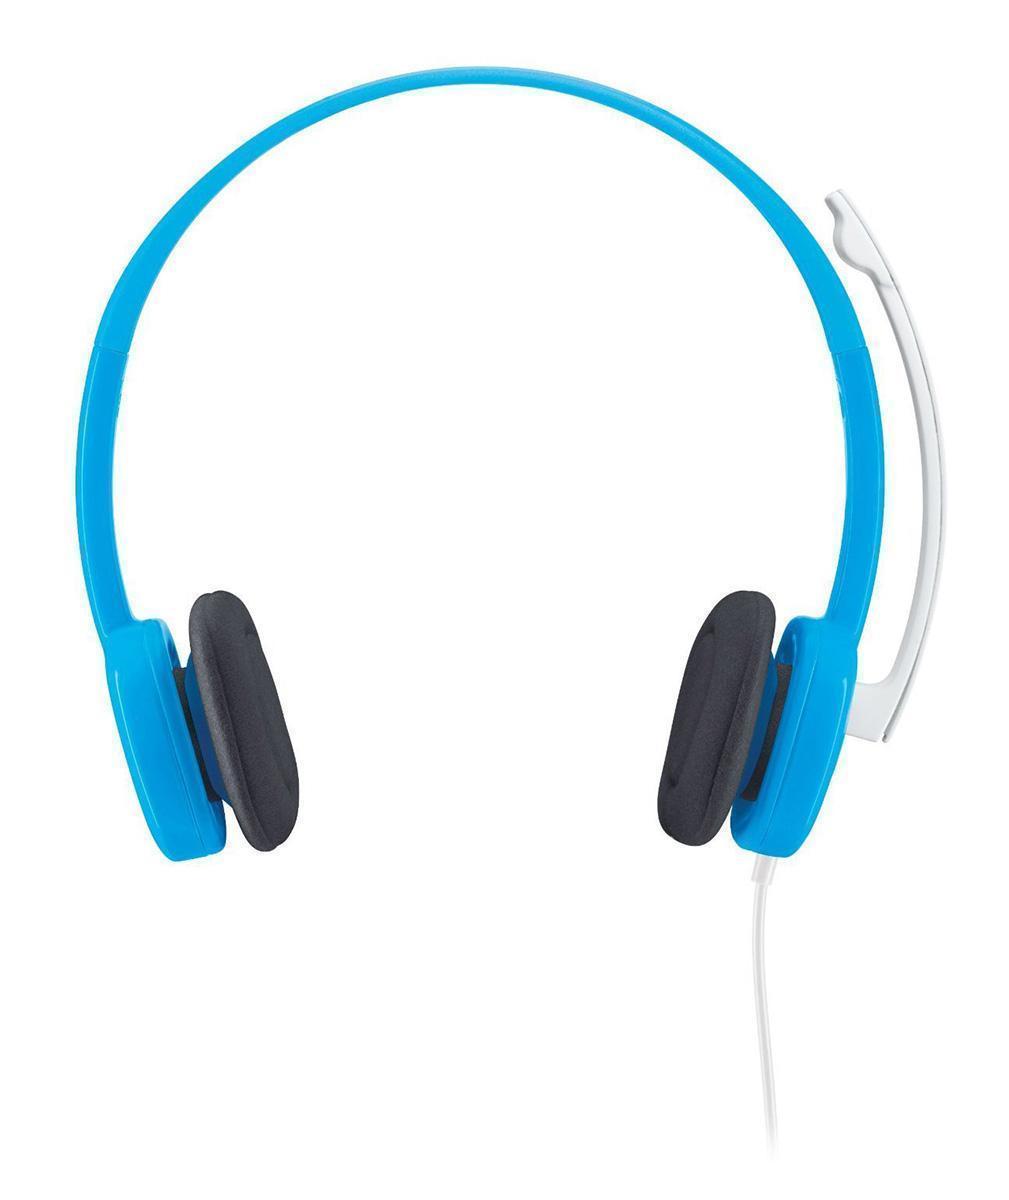 Компьютерная гарнитура Logitech Stereo Headset H150, Blueberry (981-000368) logitech h150 coconut